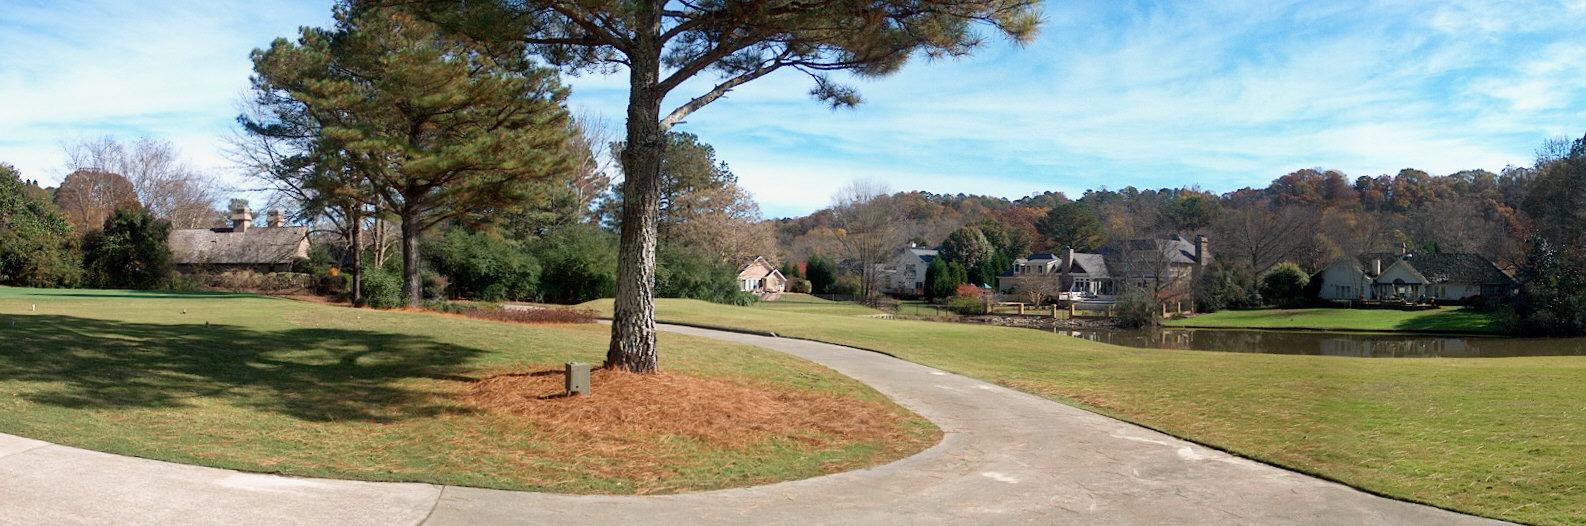 Fairway At Atlanta Country Club